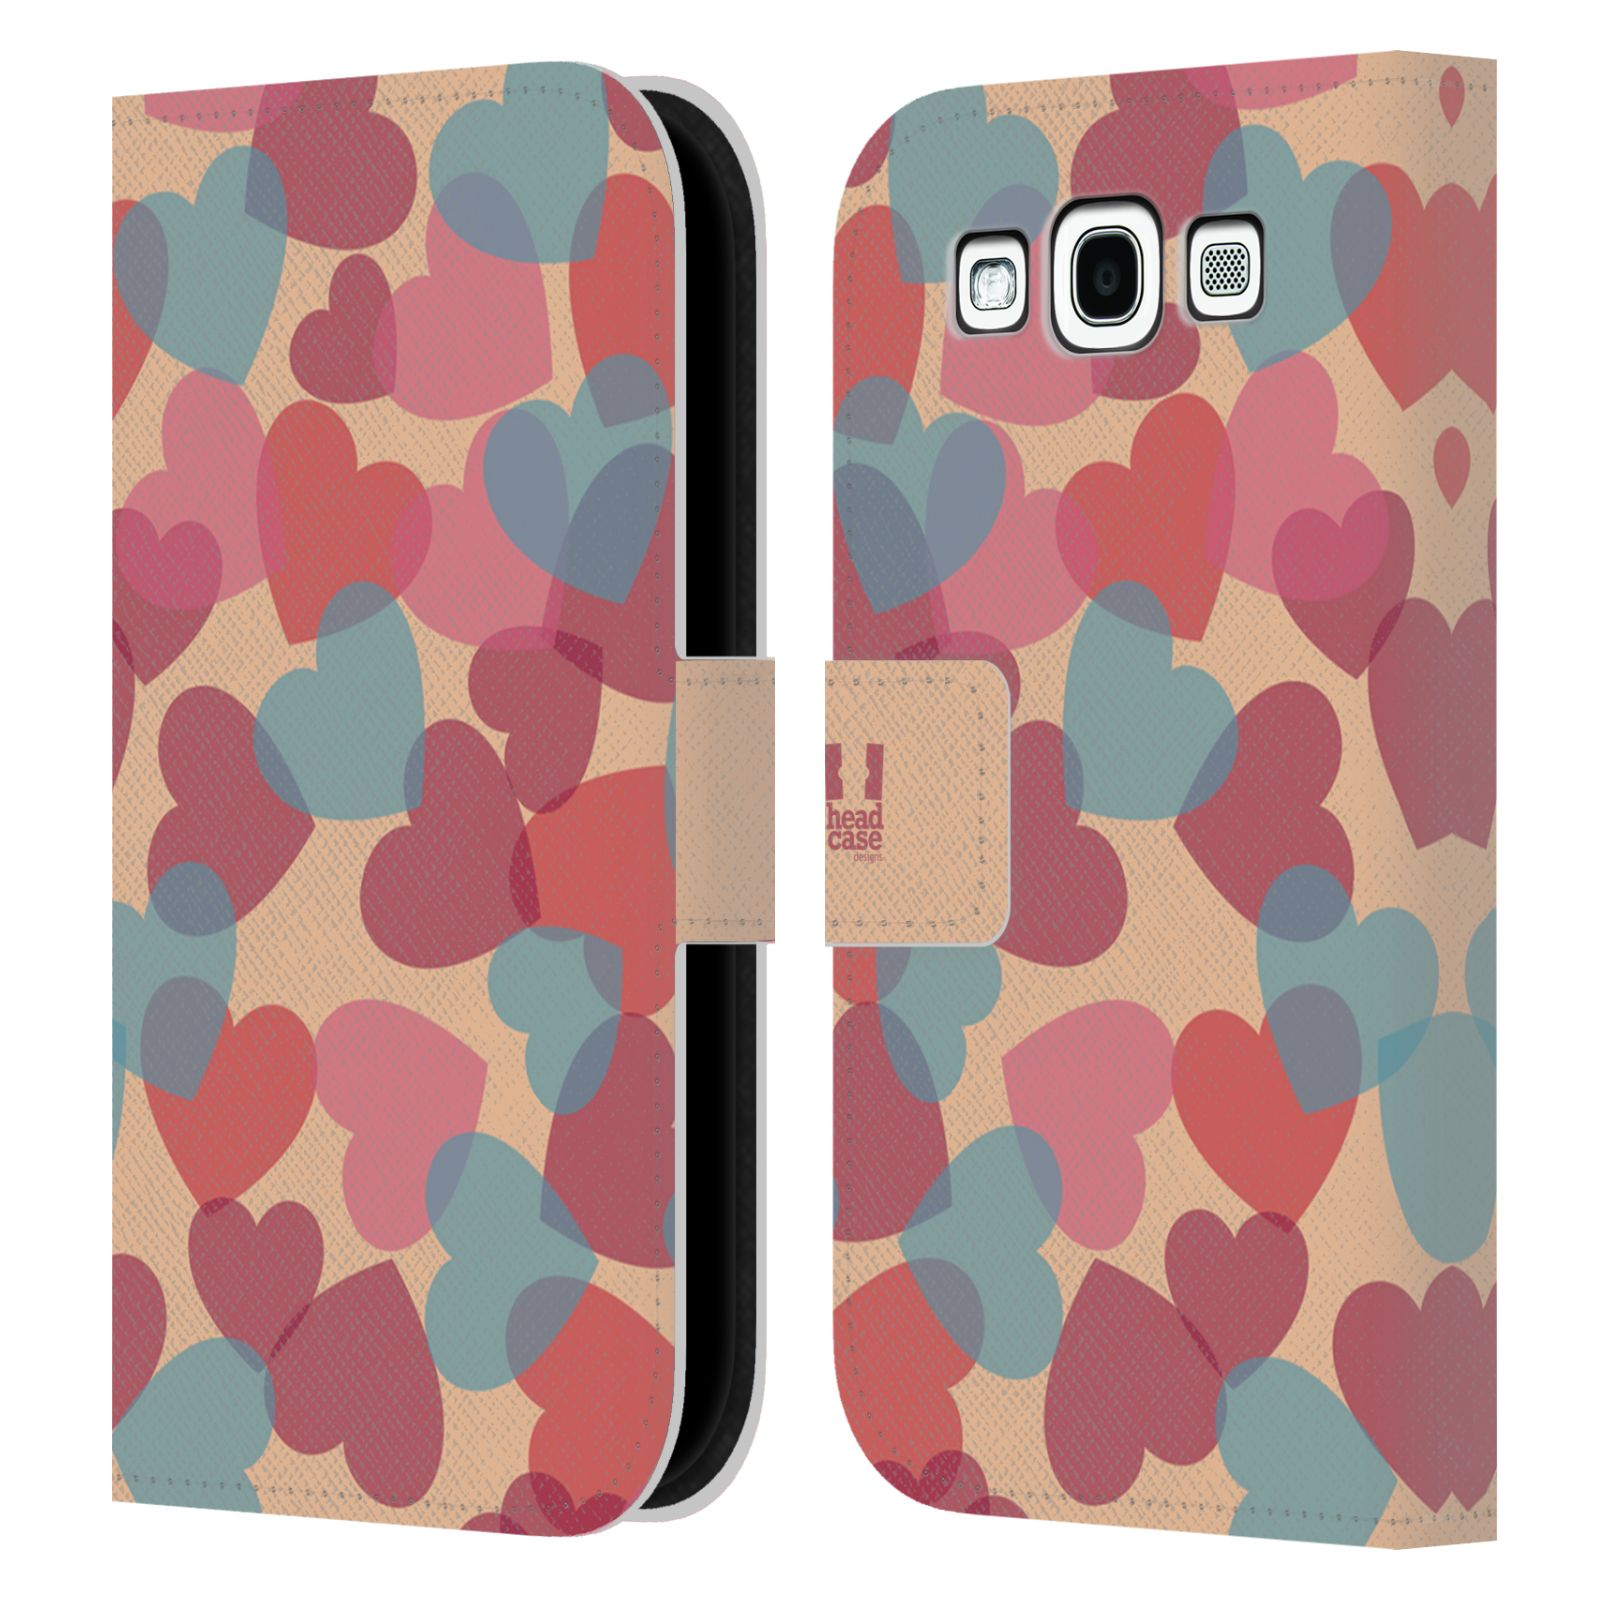 HEAD CASE Flipové pouzdro pro mobil Samsung Galaxy S3 vzor prolínající se srdíčka, srdce, láska, růžová